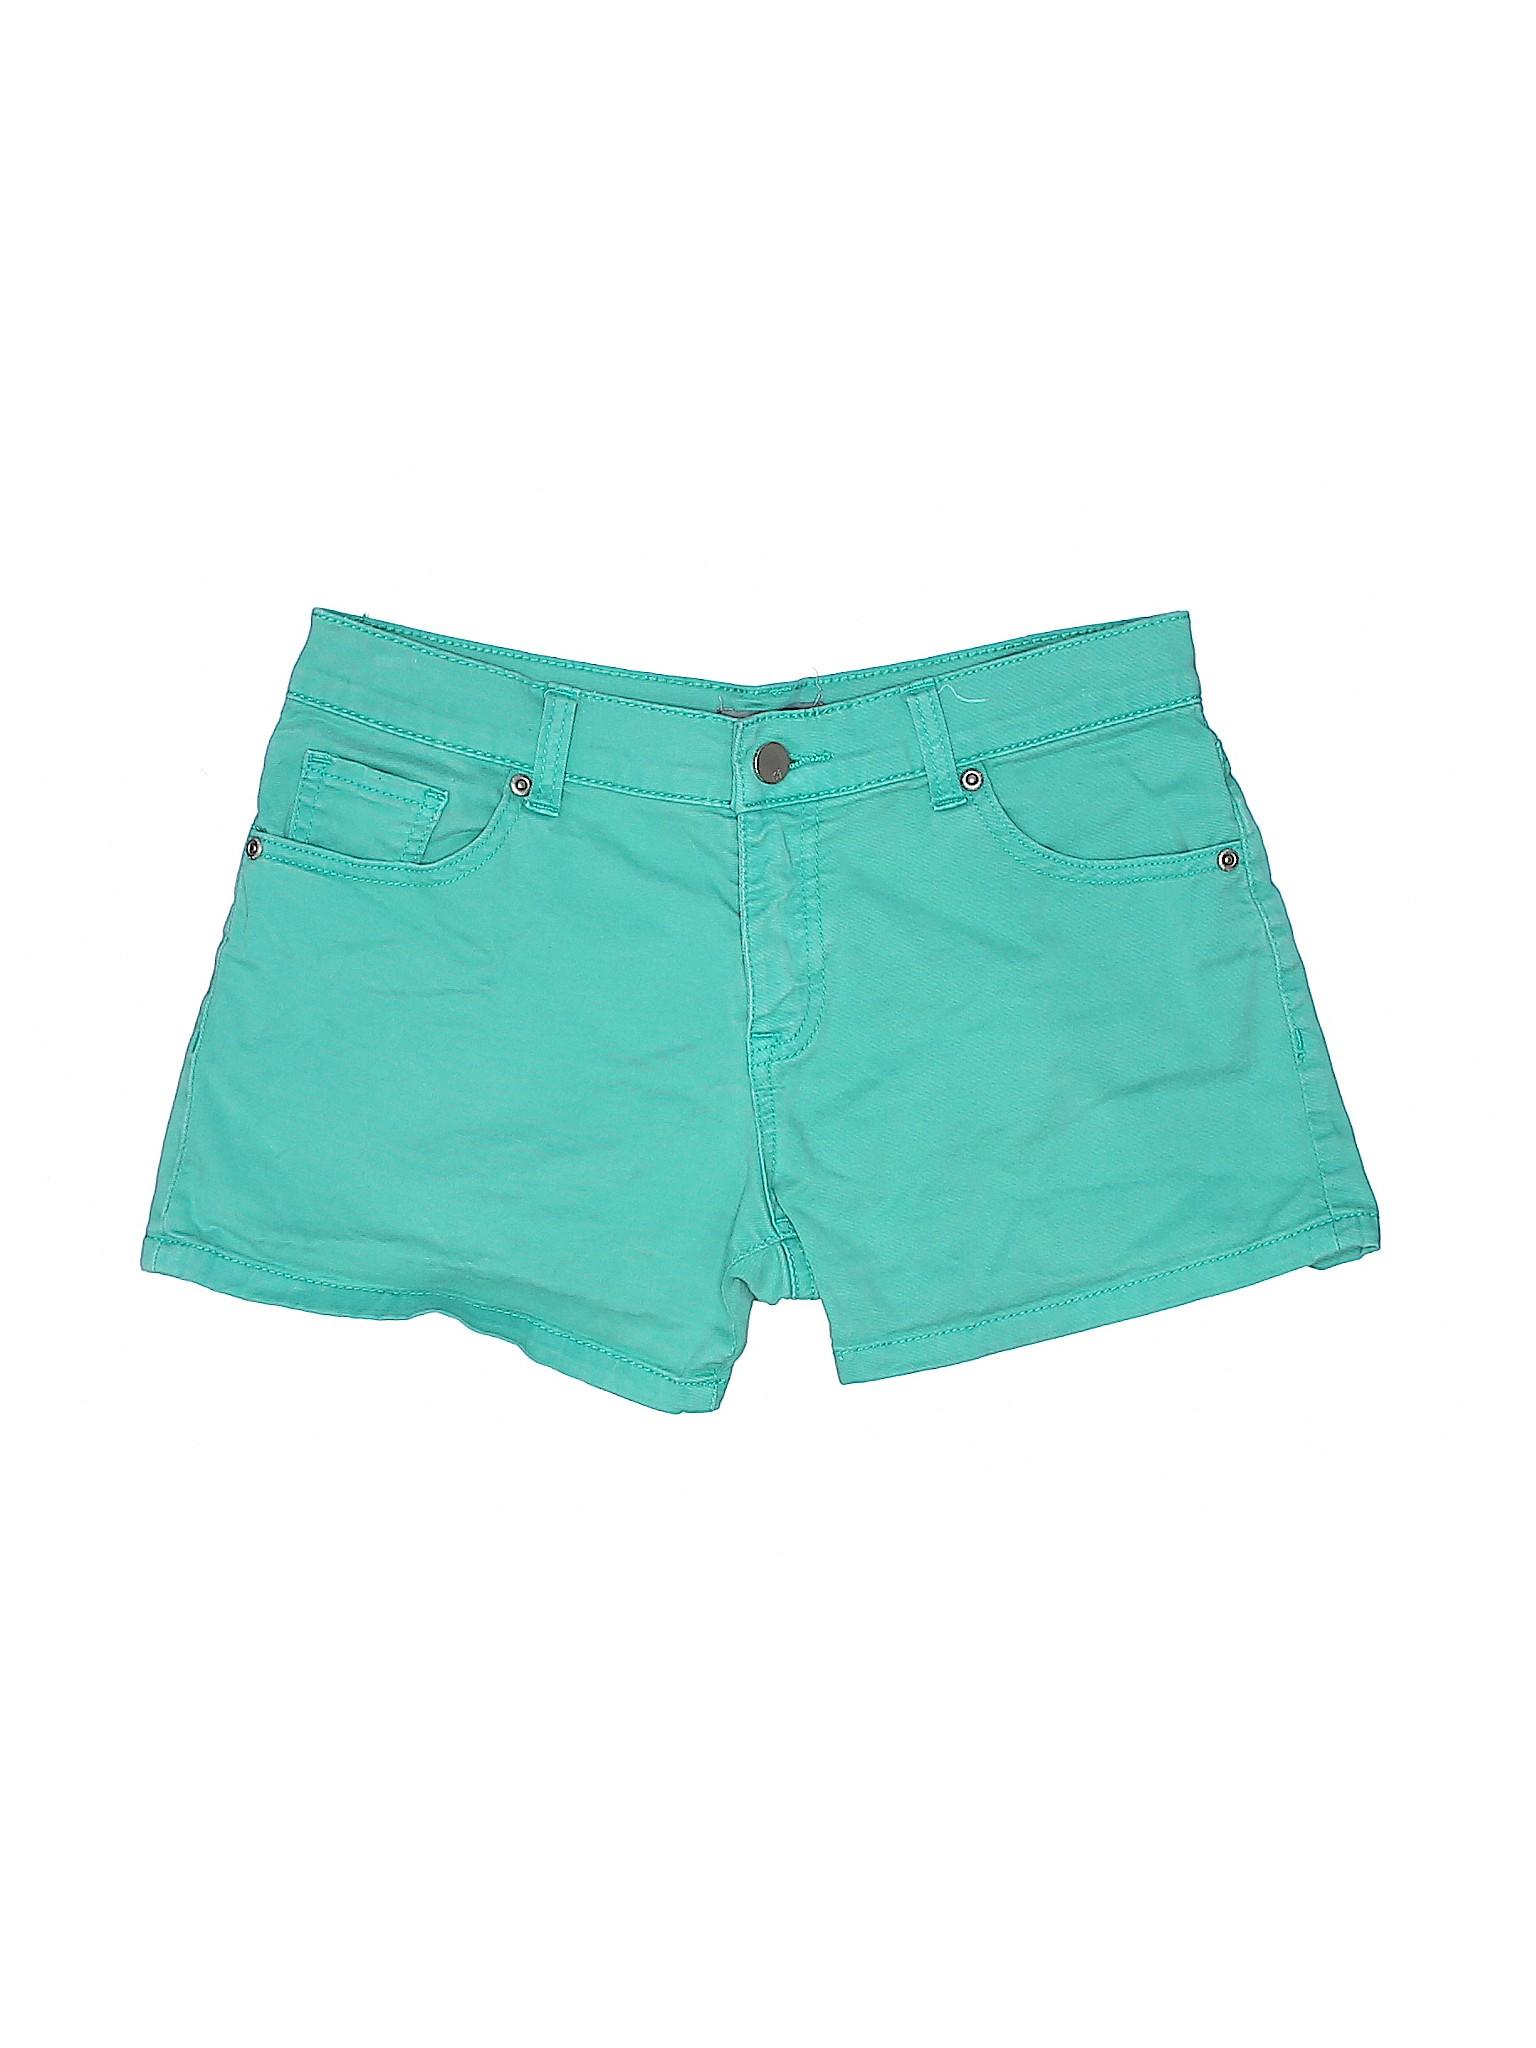 York Boutique New Shorts amp; Company Denim HYFA0f